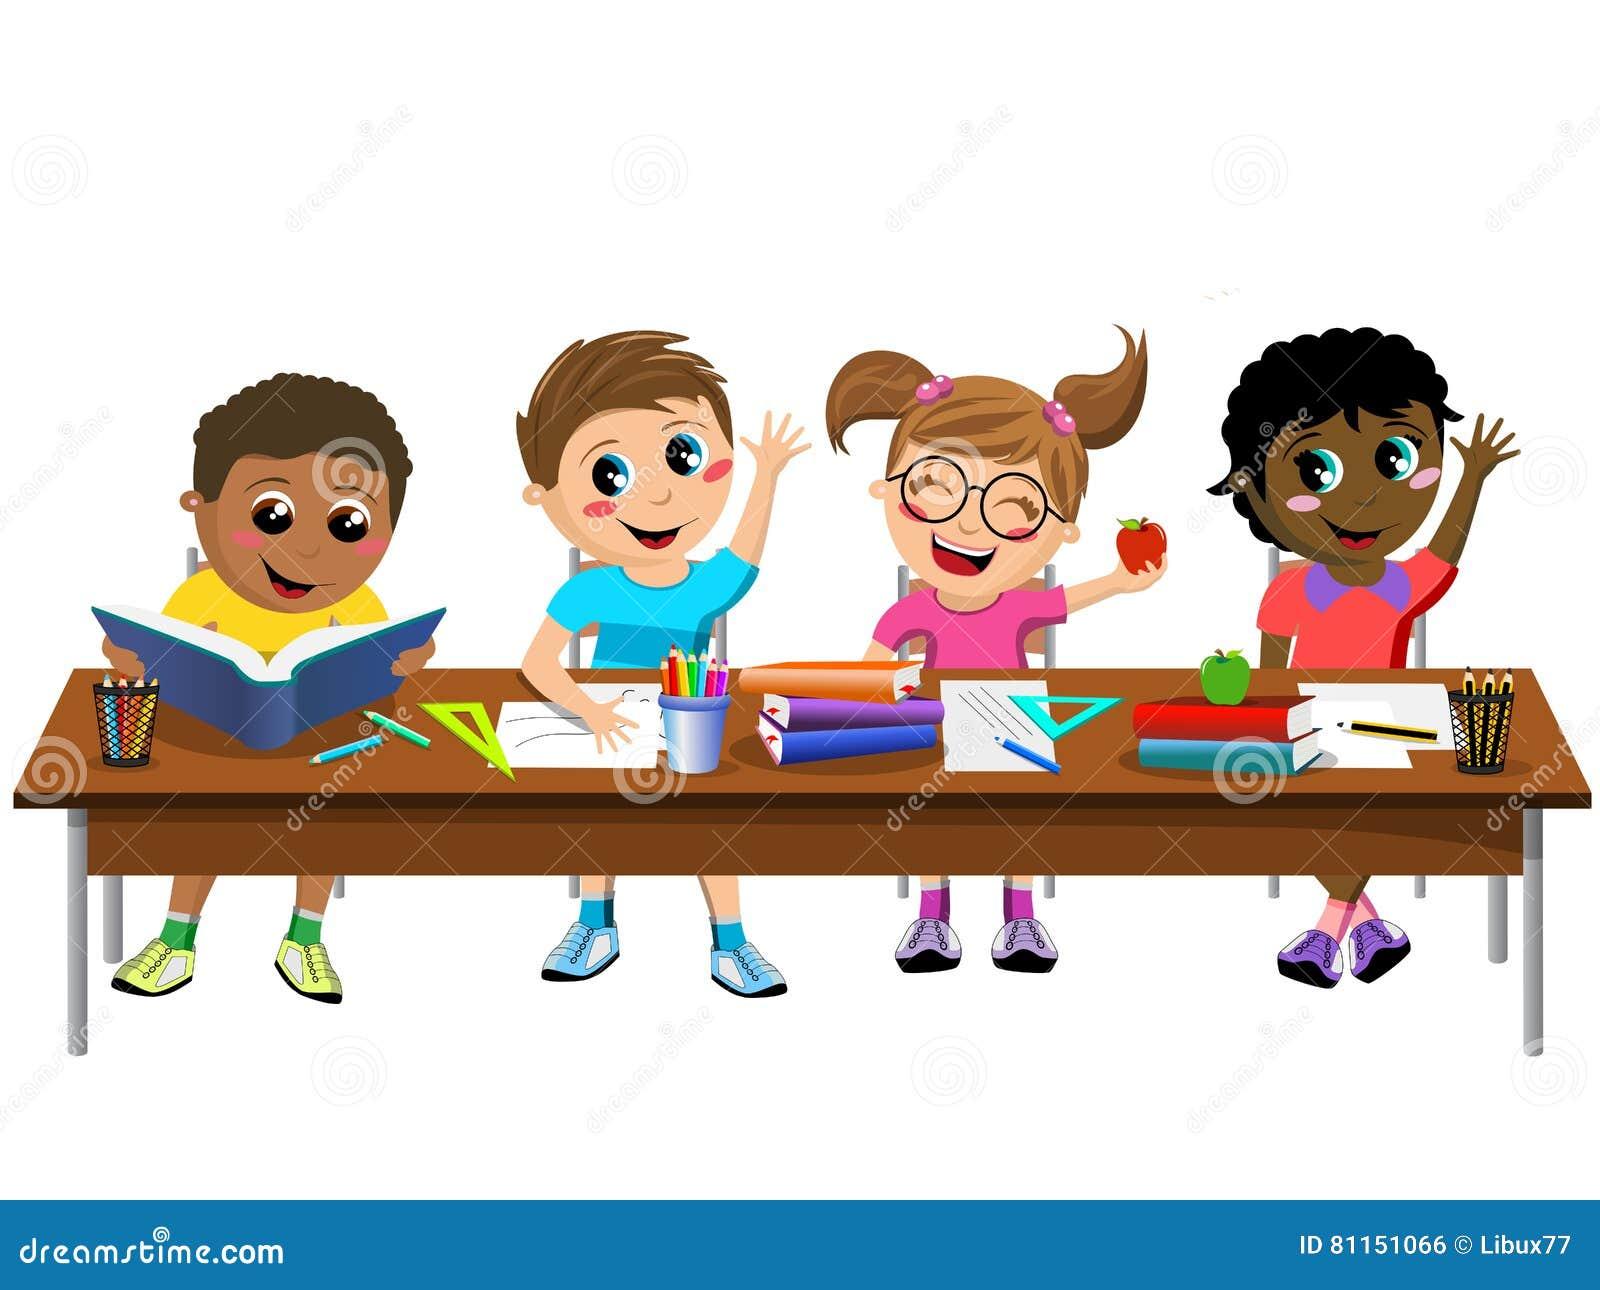 Kids working at desk